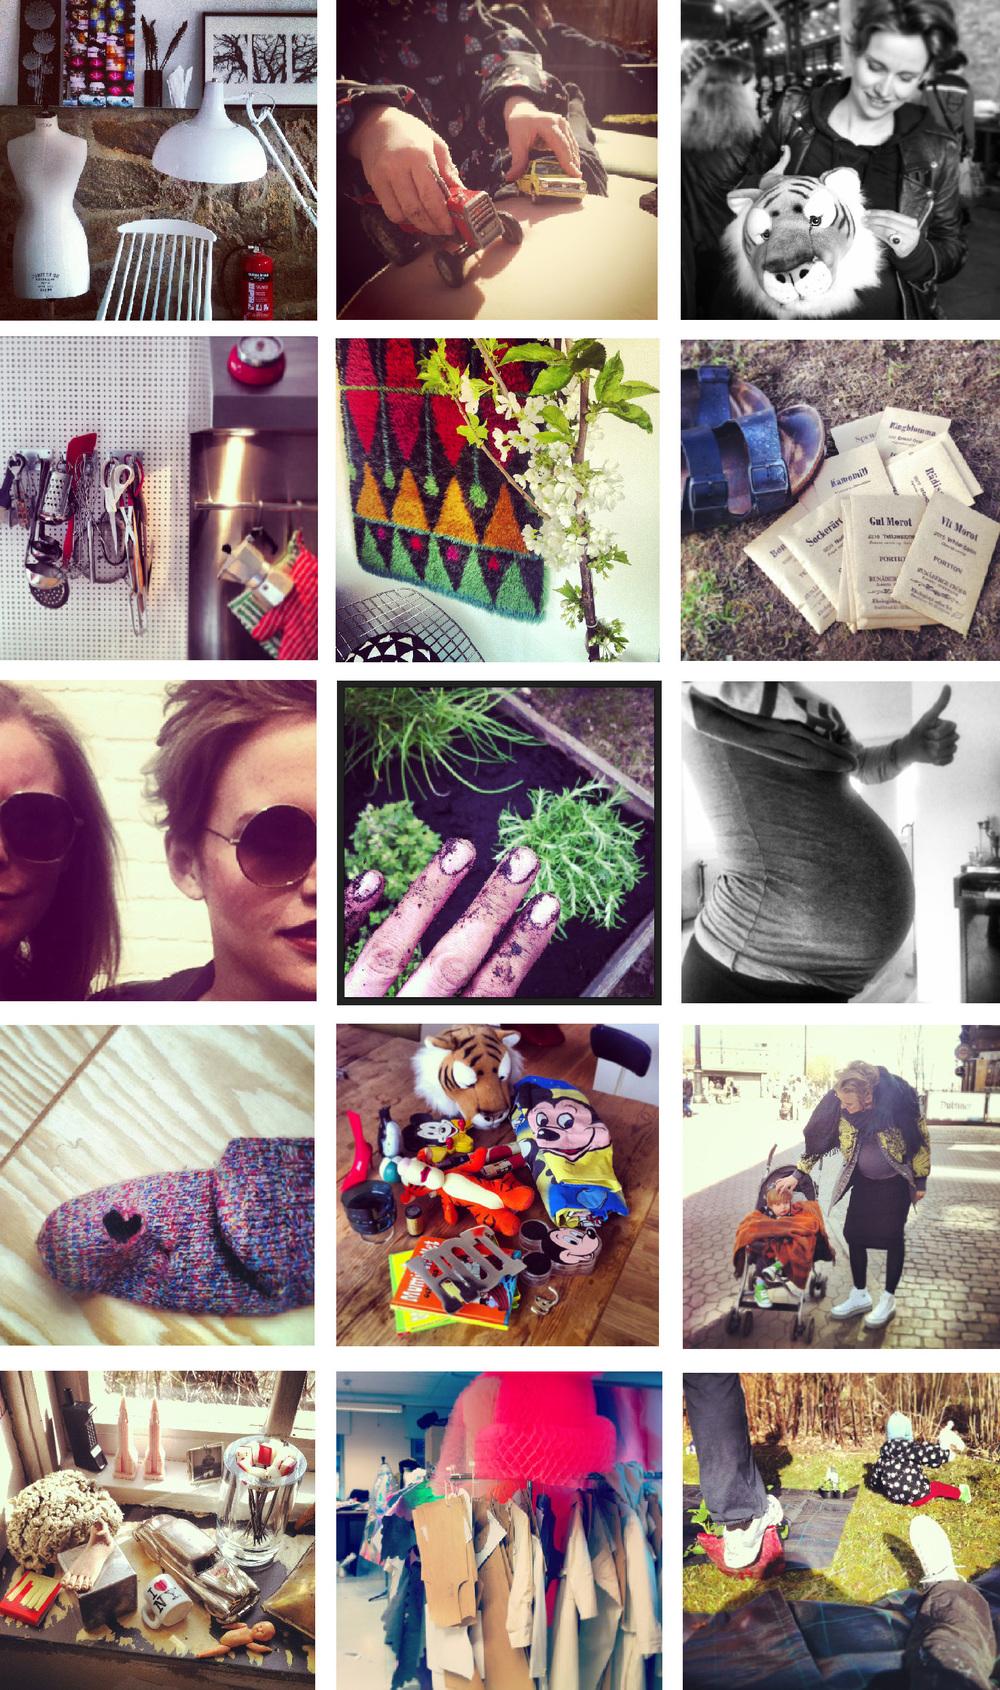 Anotherblog_Aklidstrom_Instagram.jpg